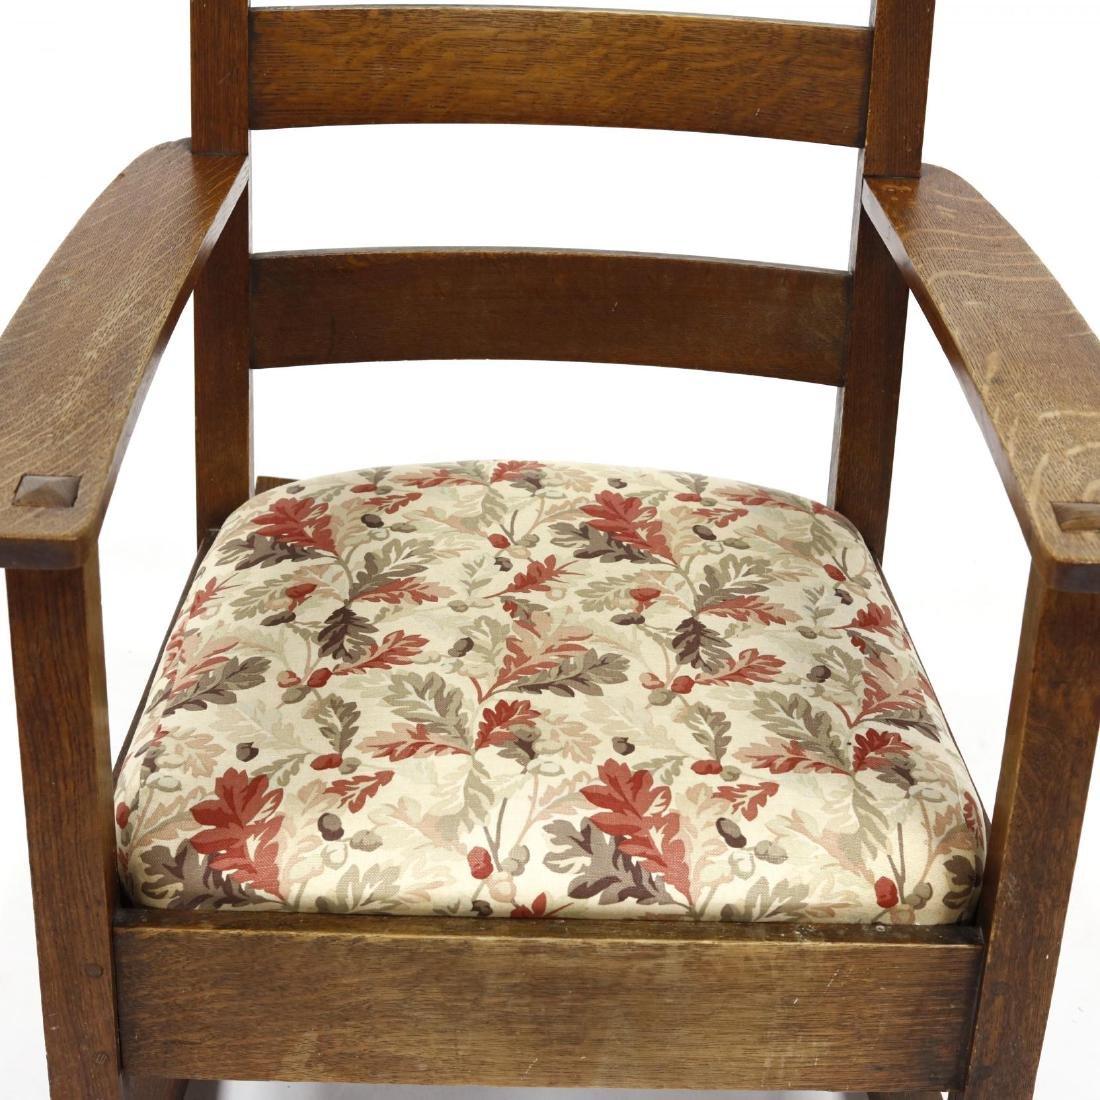 Limbert, Mission Oak Rocking Chair - 2